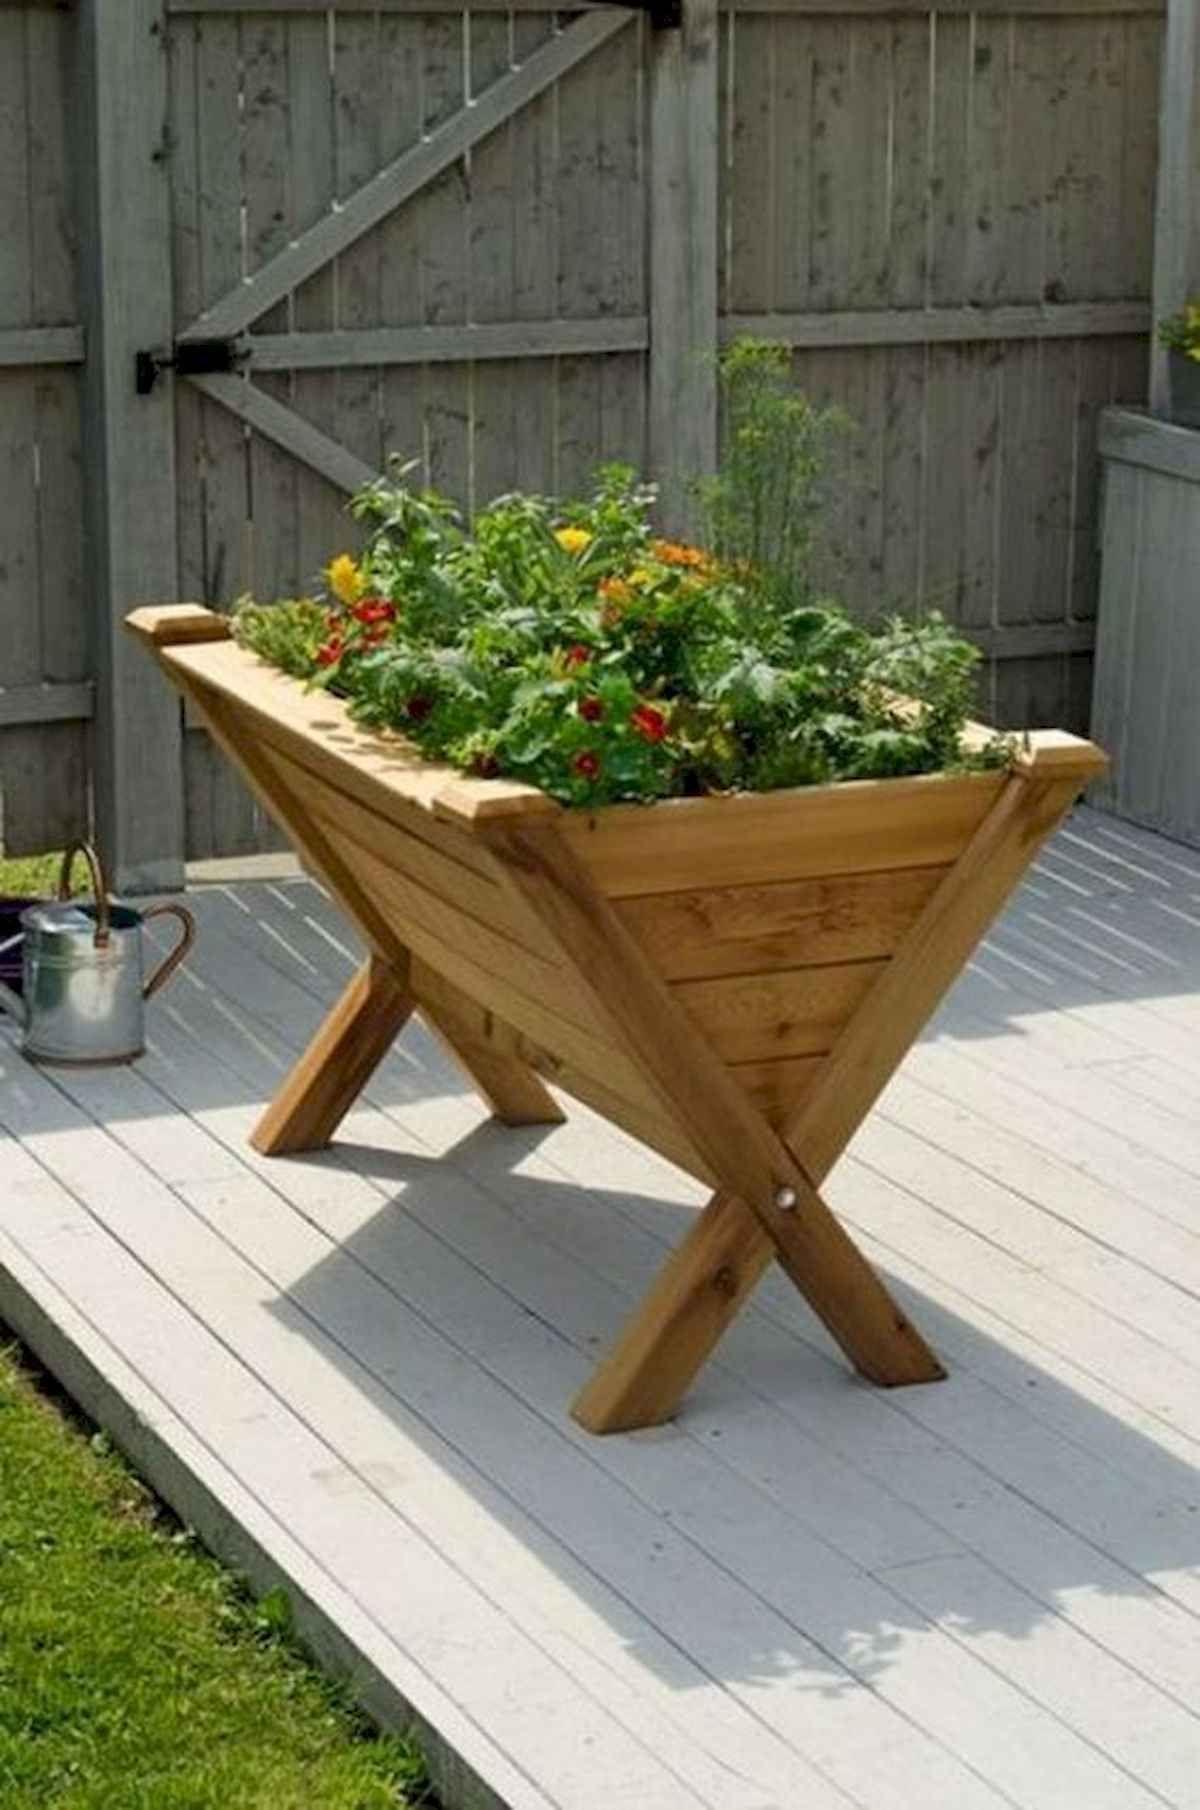 Transformation Palette En Jardiniere boîte jardin | decoration jardin, jardinière en bois, déco